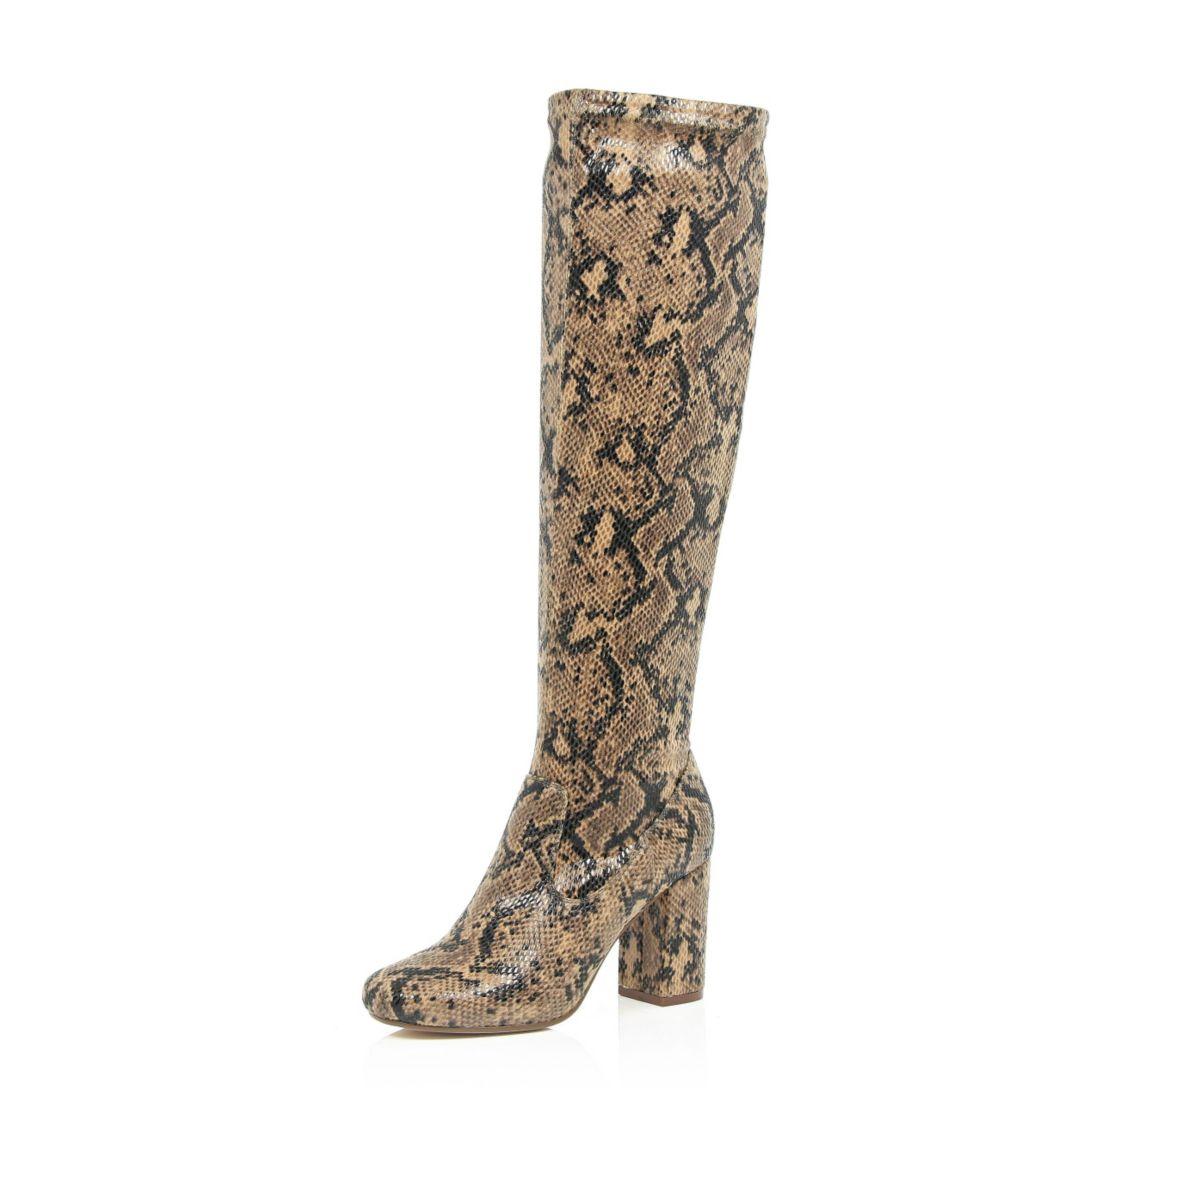 Brown snake print knee high boots